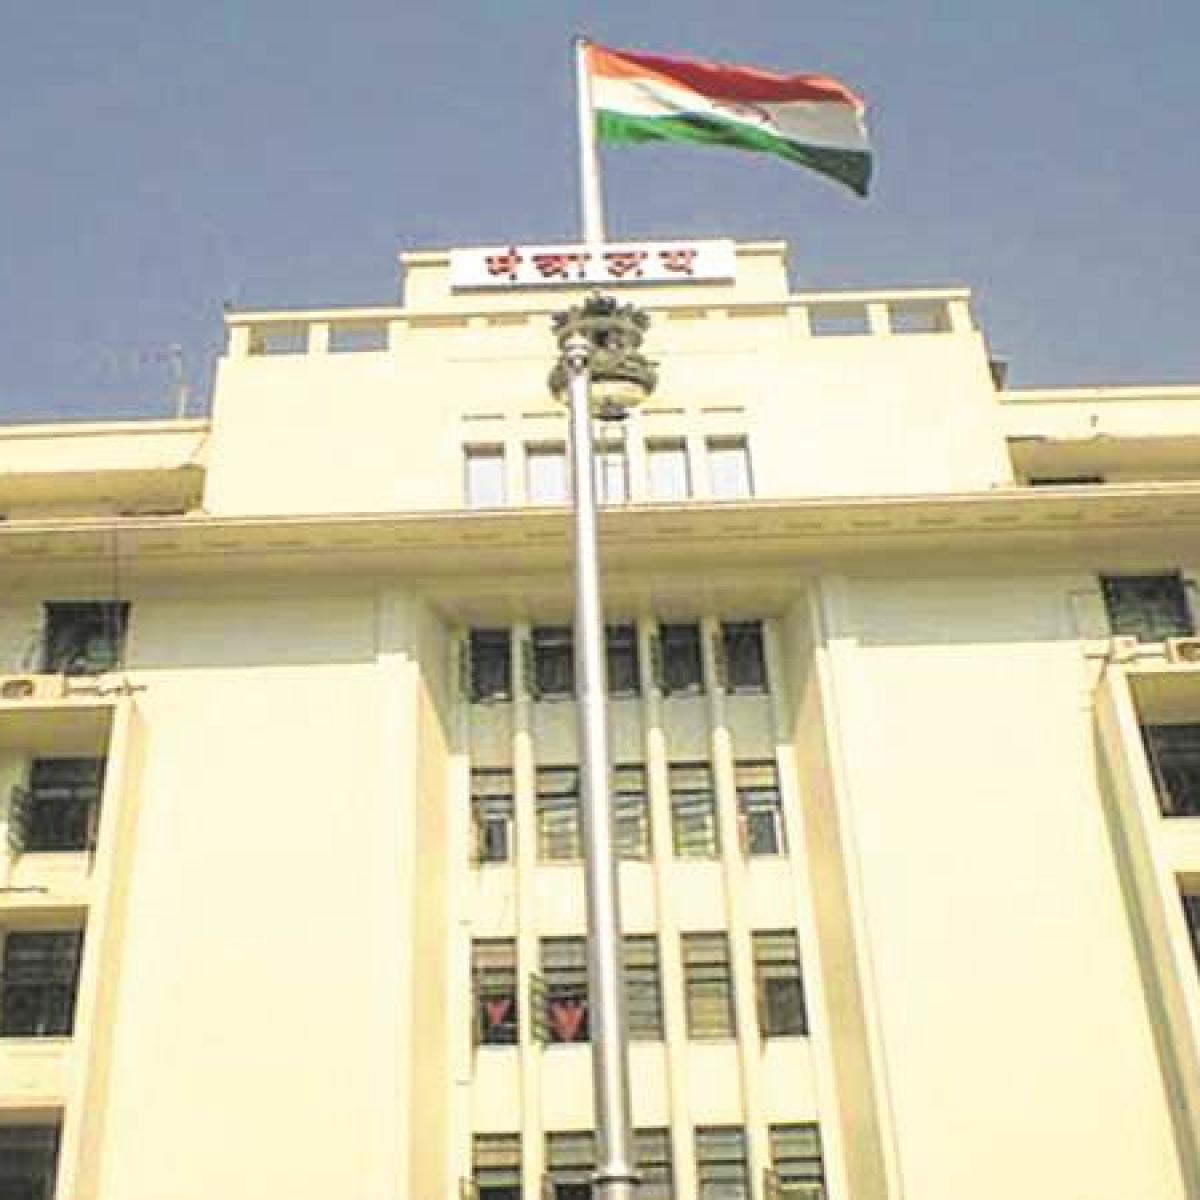 Coronavirus in Mumbai: IAS officer, 9 staff members test COVID-19 positive in Mantralaya